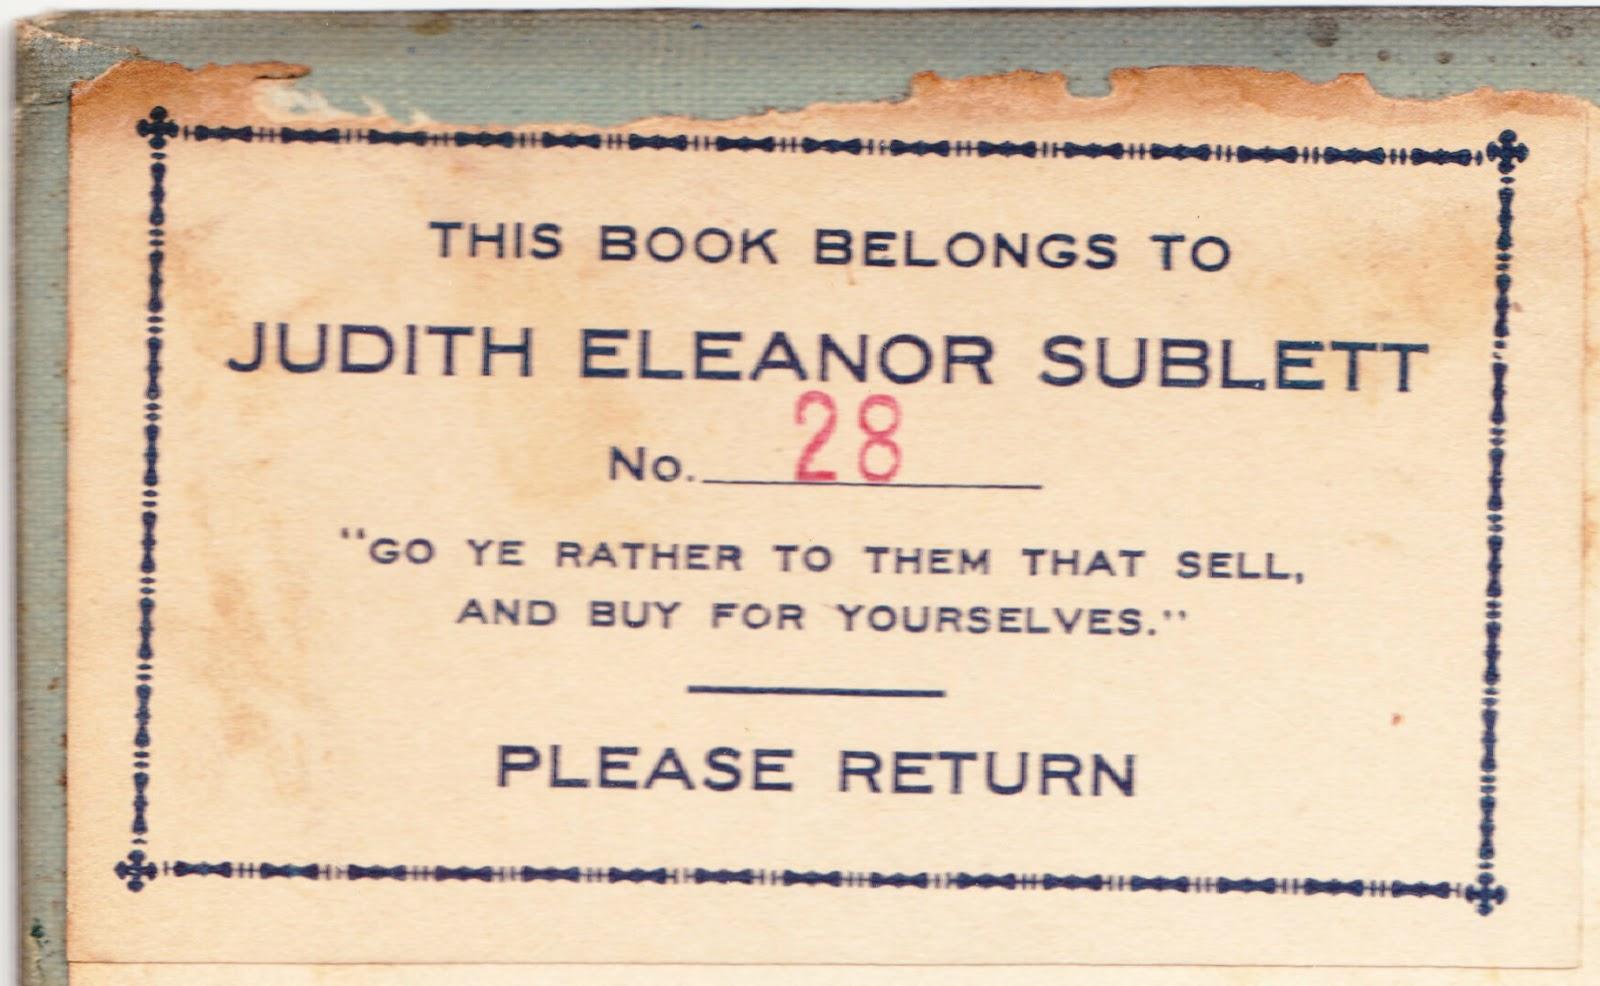 judith eleanor subletts bookplate